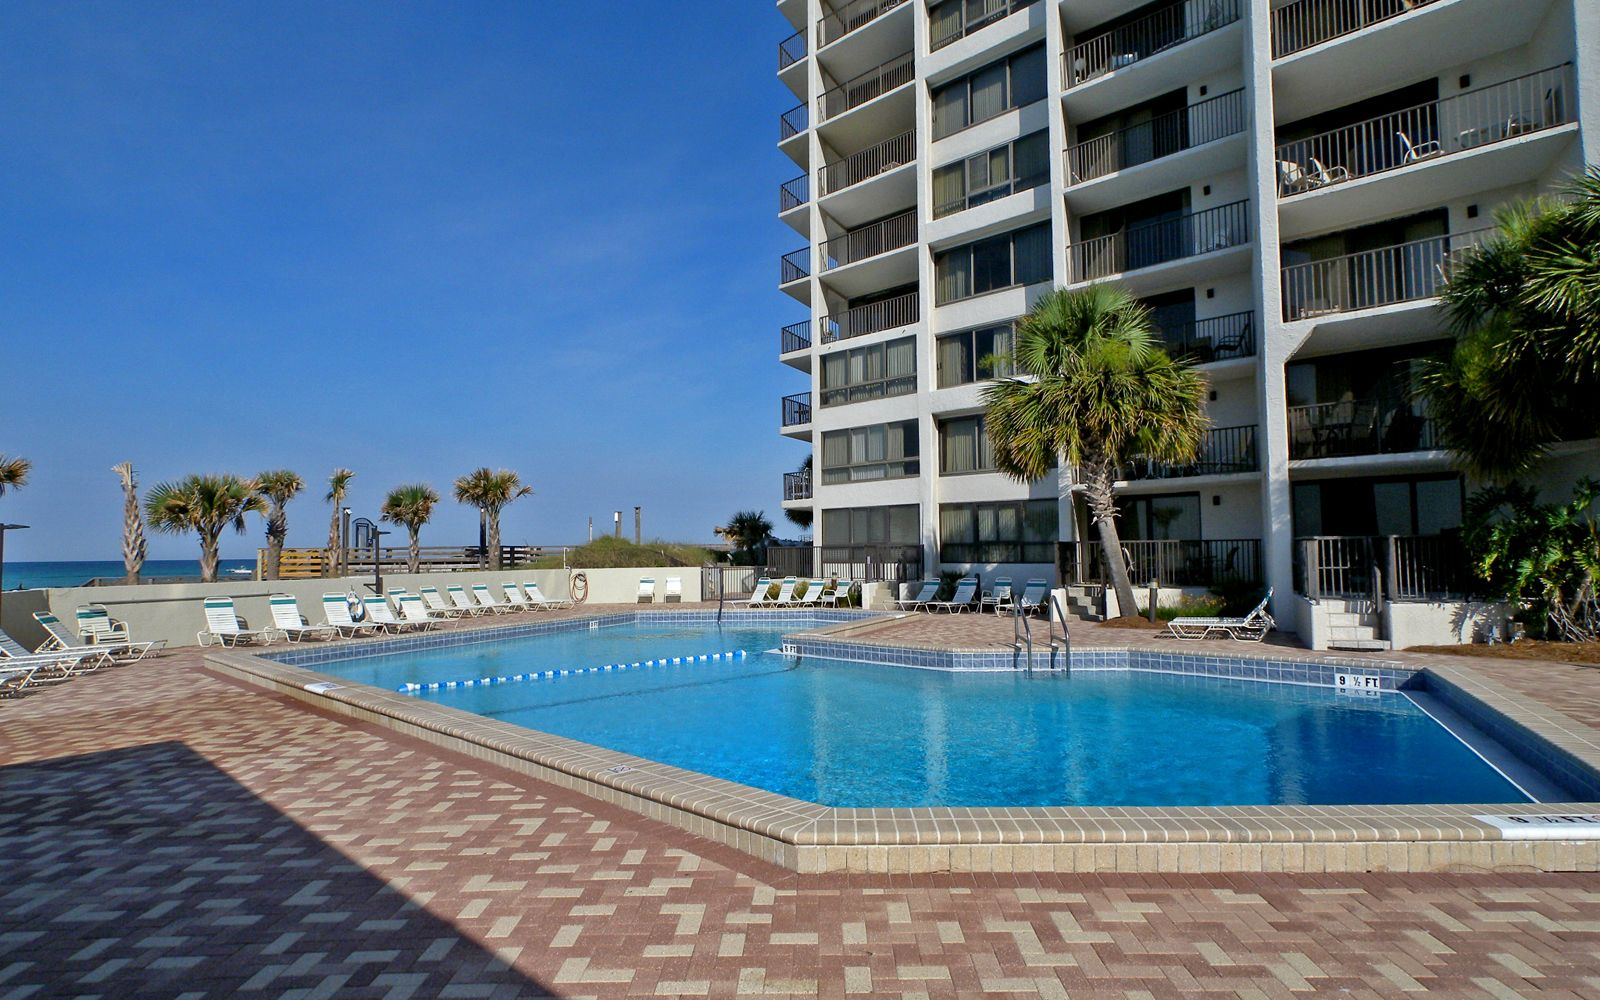 San Destin Resort and Golf Beachside One. This Destin